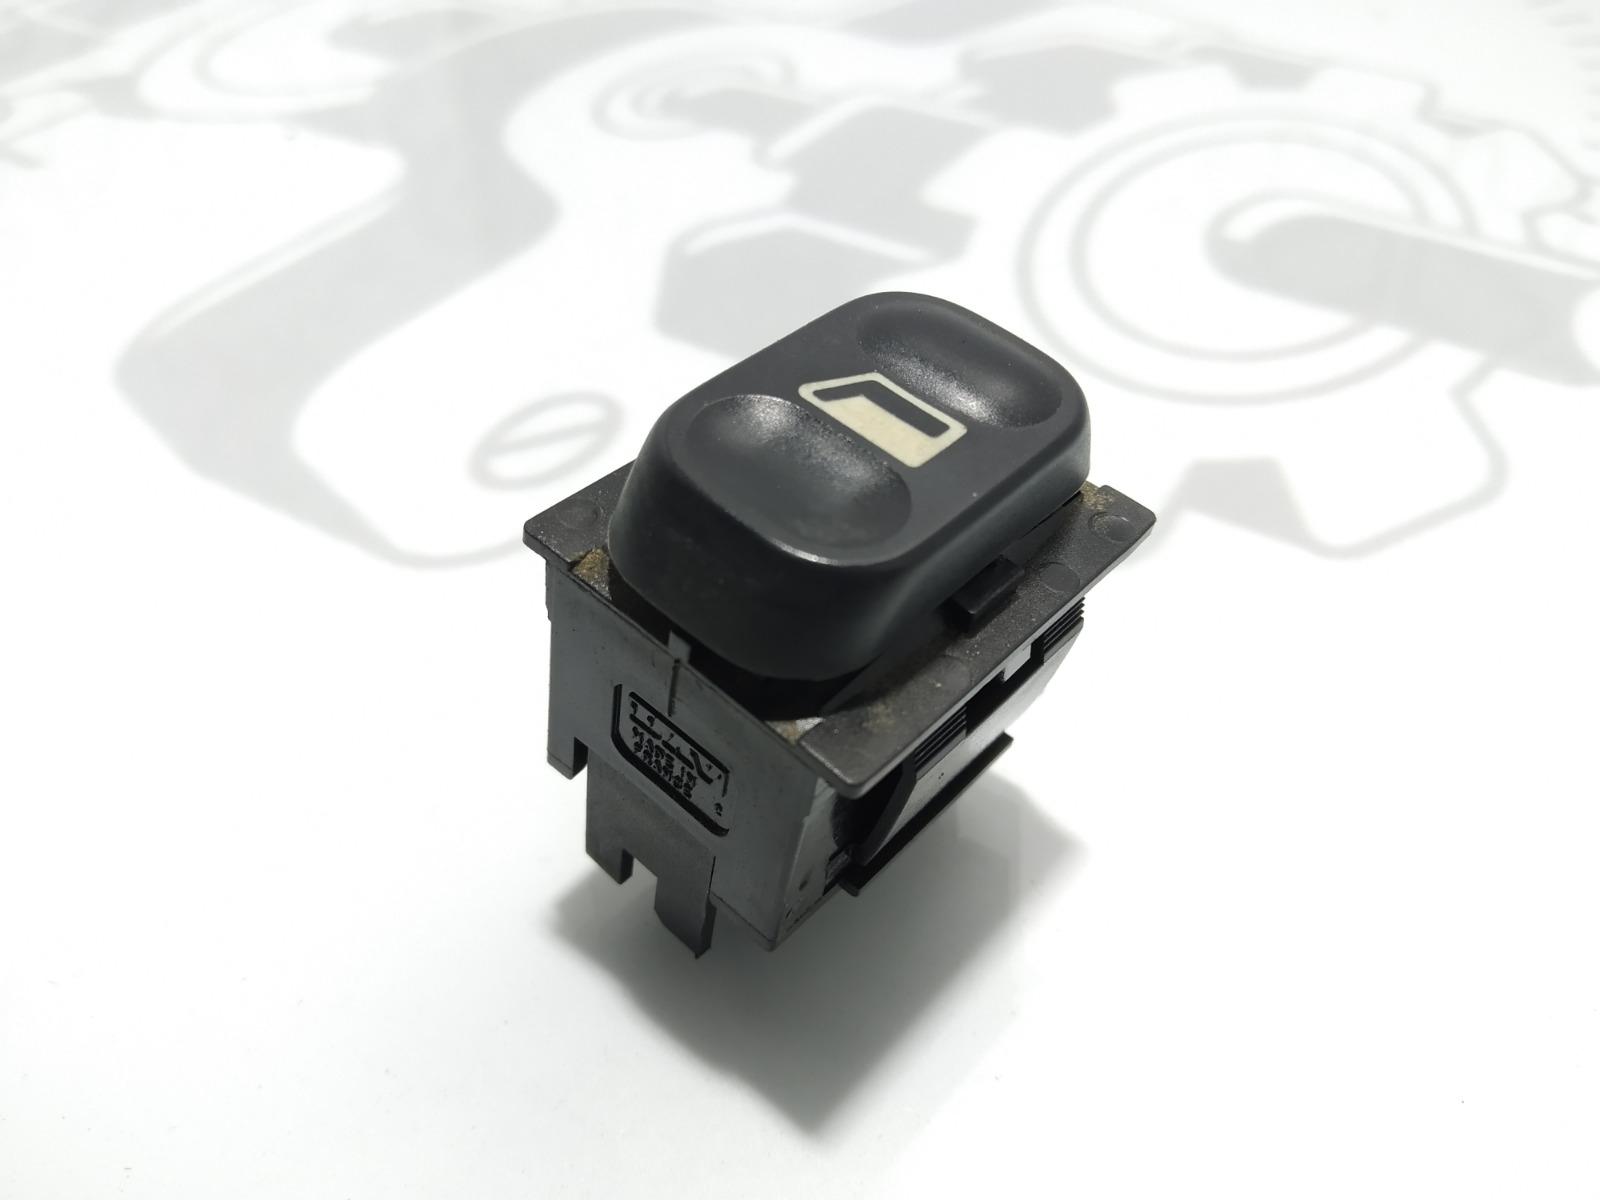 Кнопка стеклоподъемника Fiat Ulysse 2.0 HDI 2000 (б/у)